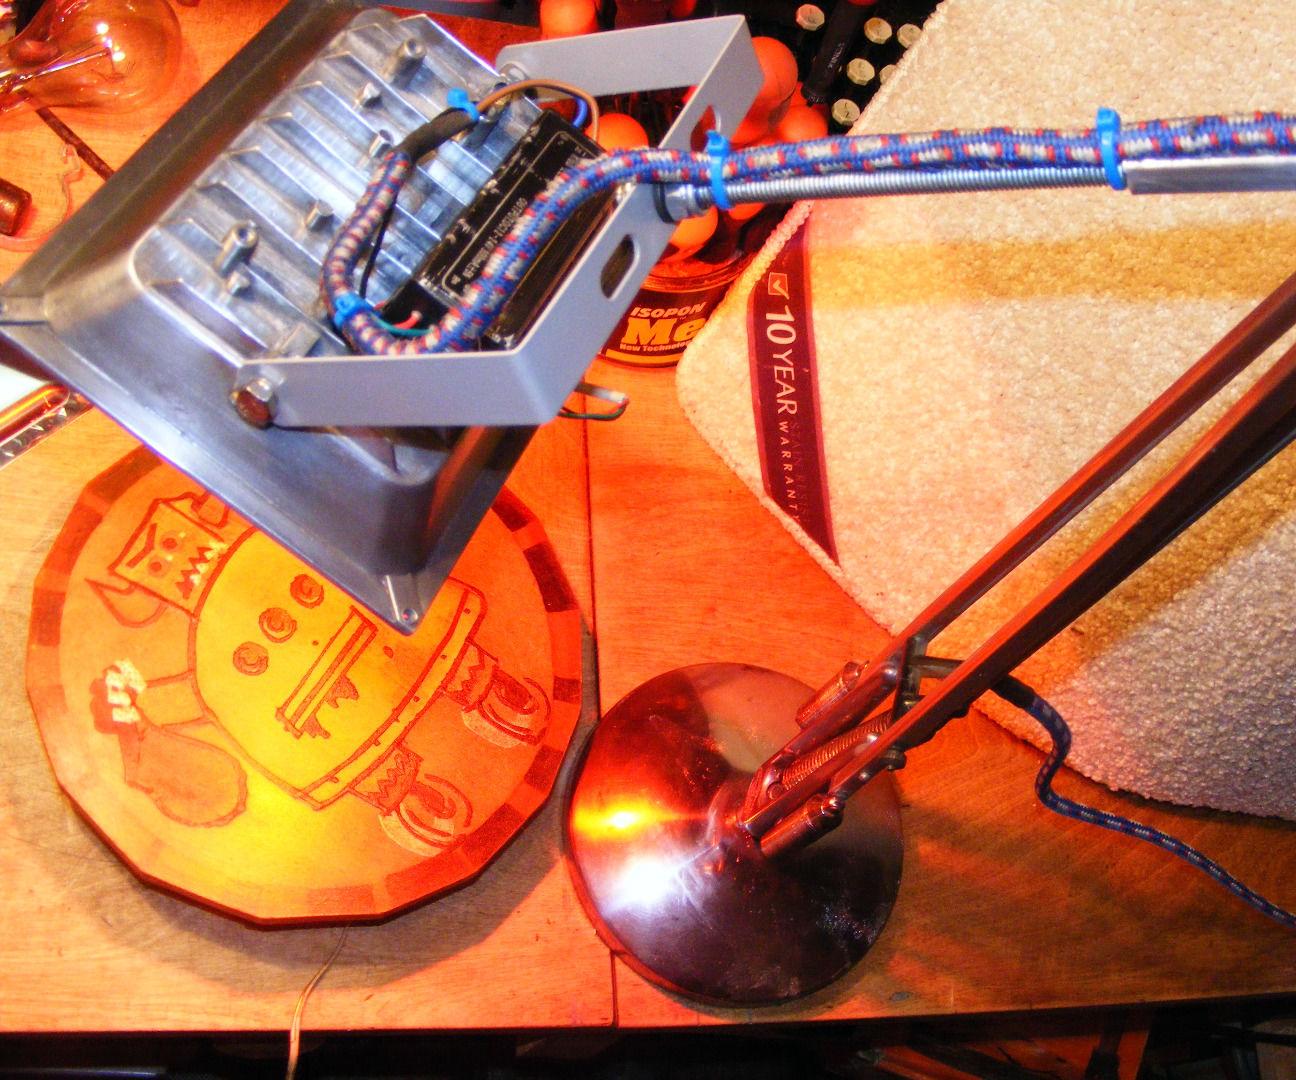 Fierce anglepoise rgb + strobe desk lamp shiny silver future retro punk party